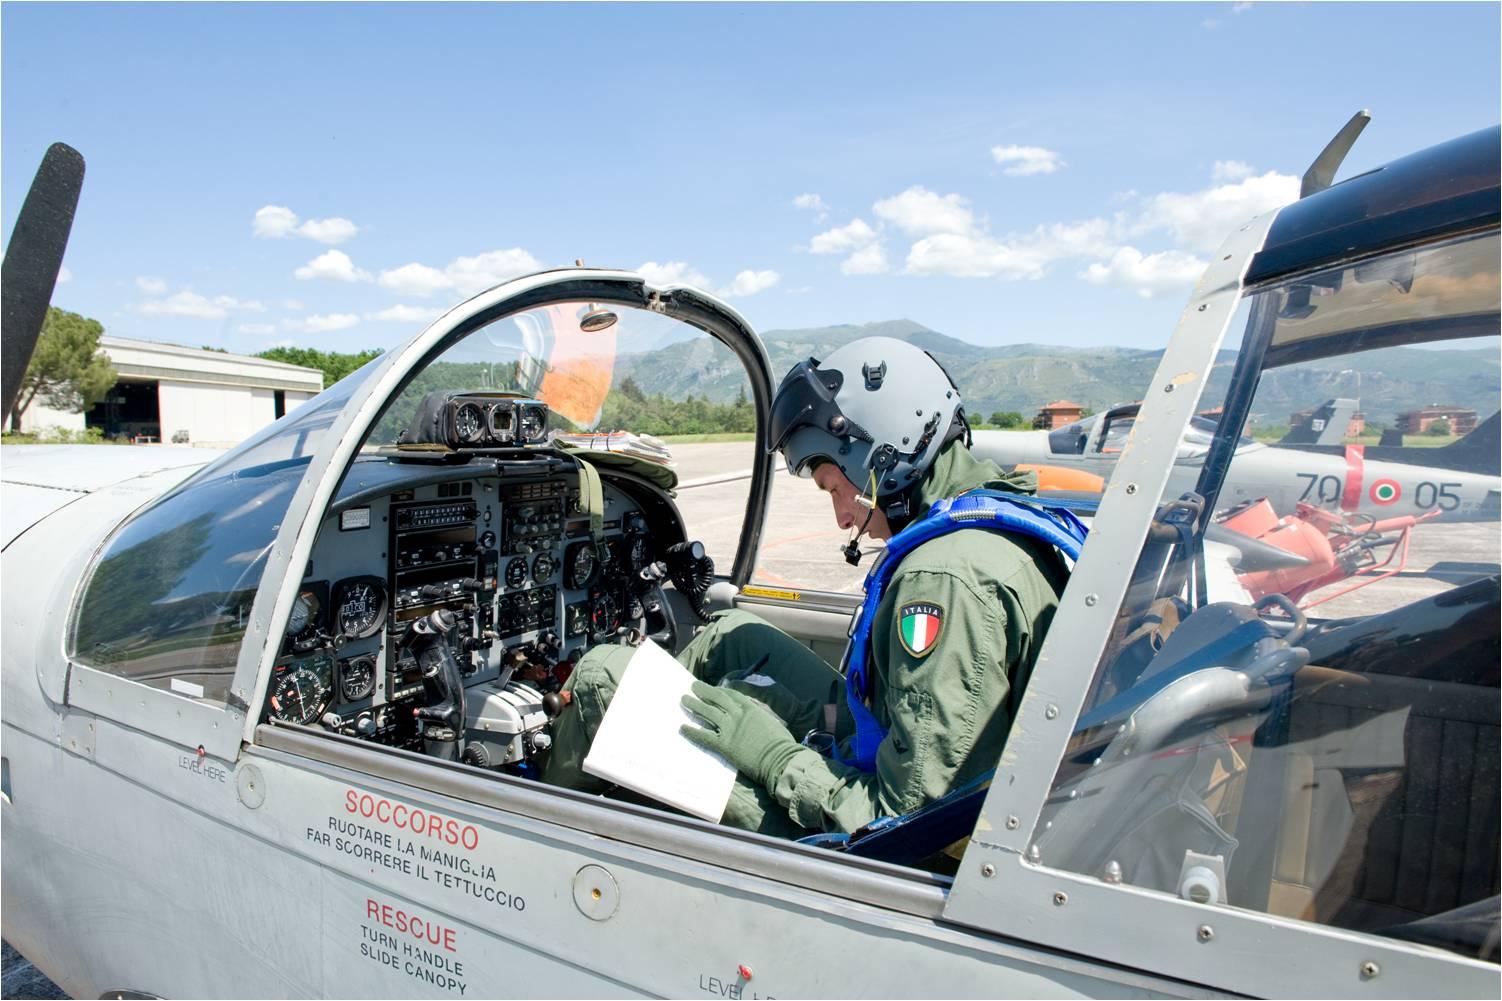 70 Stormo: assegnati i Brevetti di Pilota